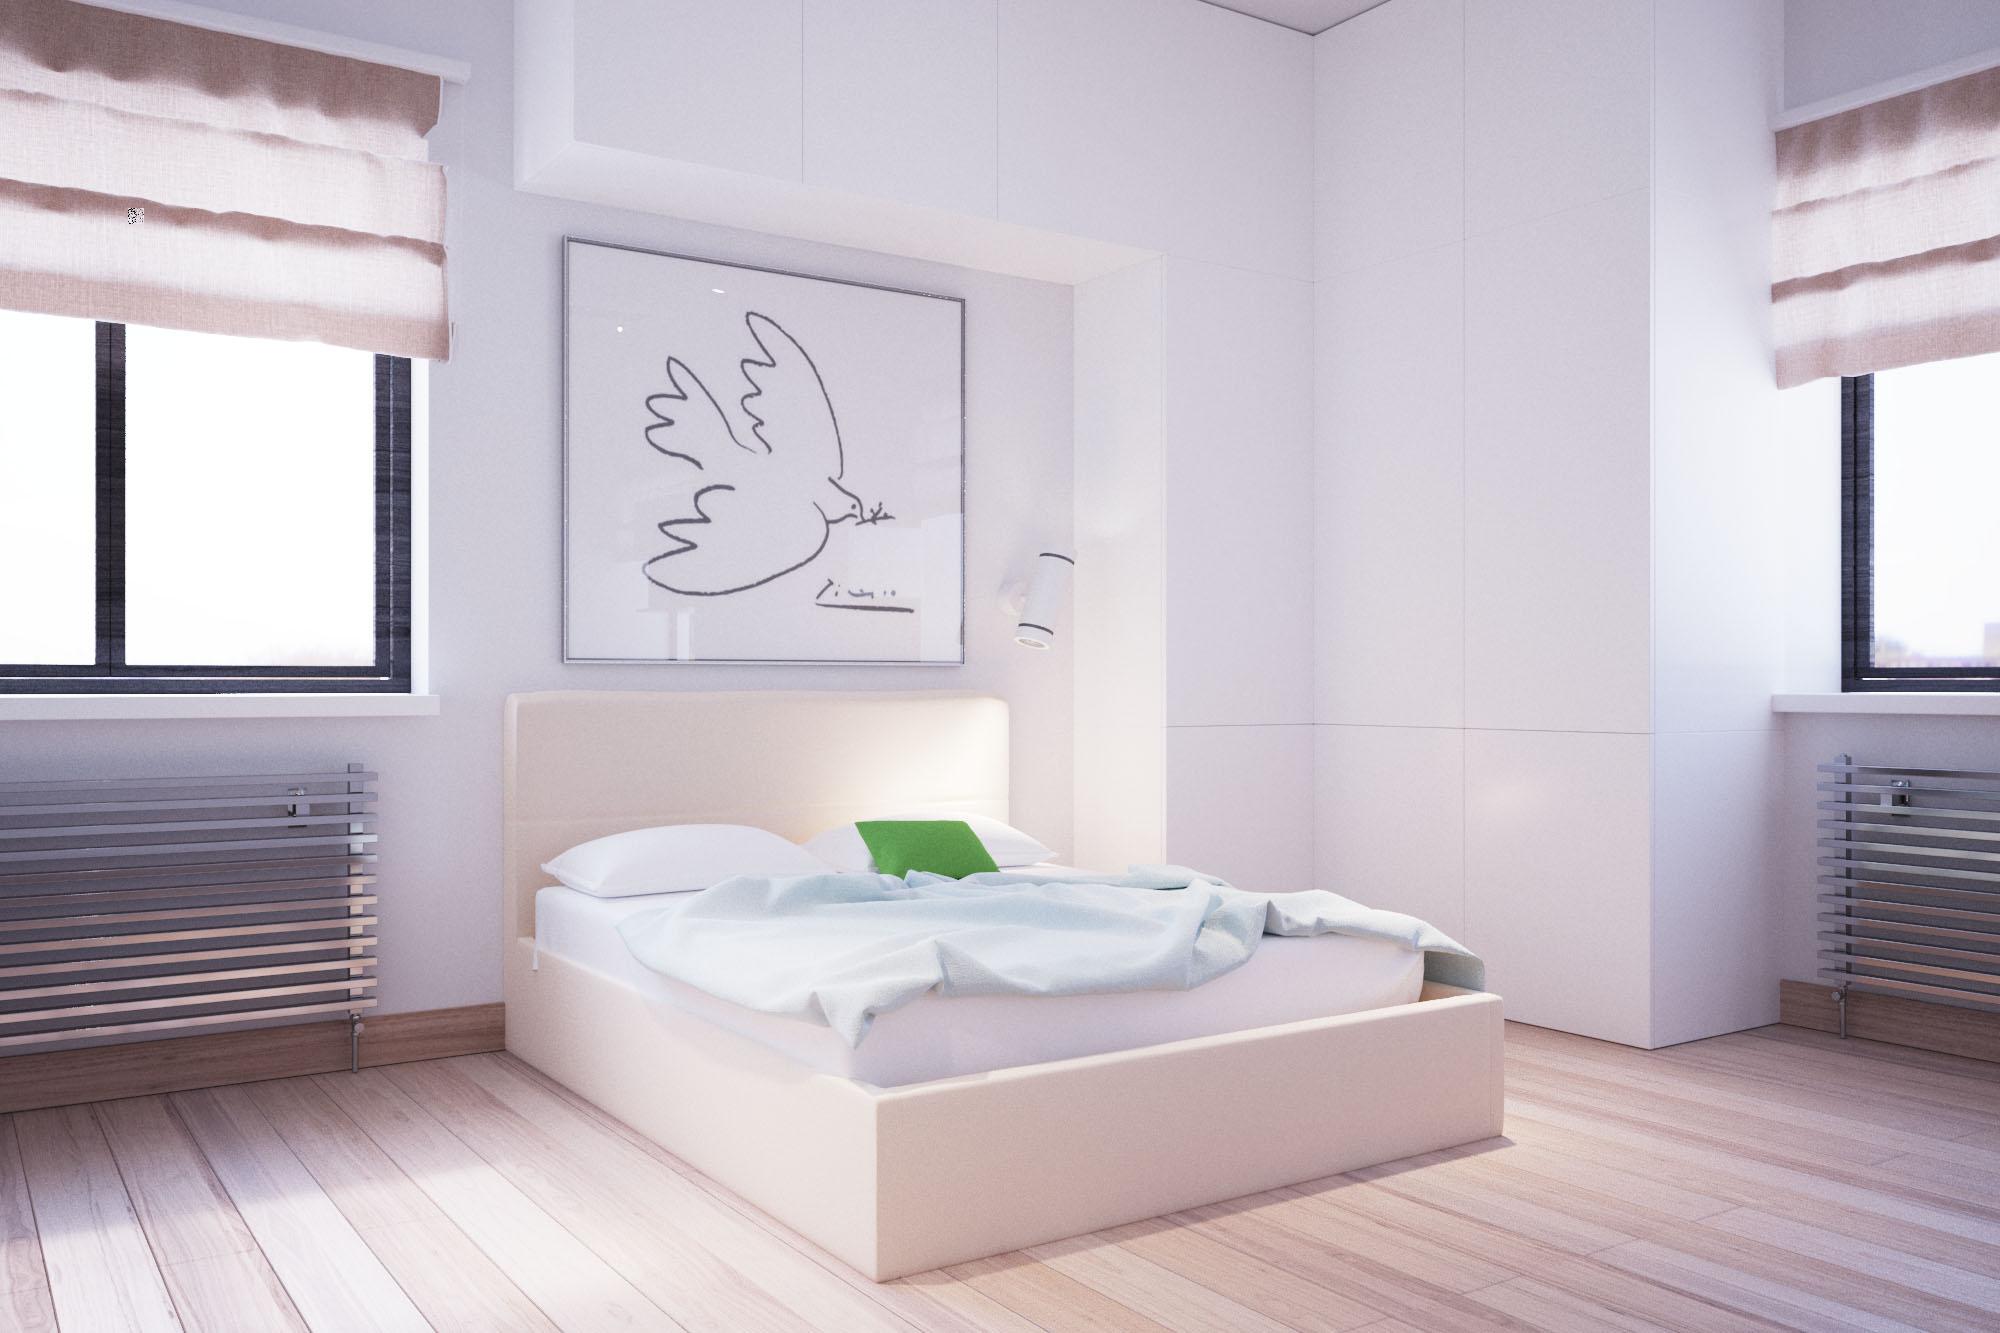 015 Дизайн интерьера двухуровневой квартиры